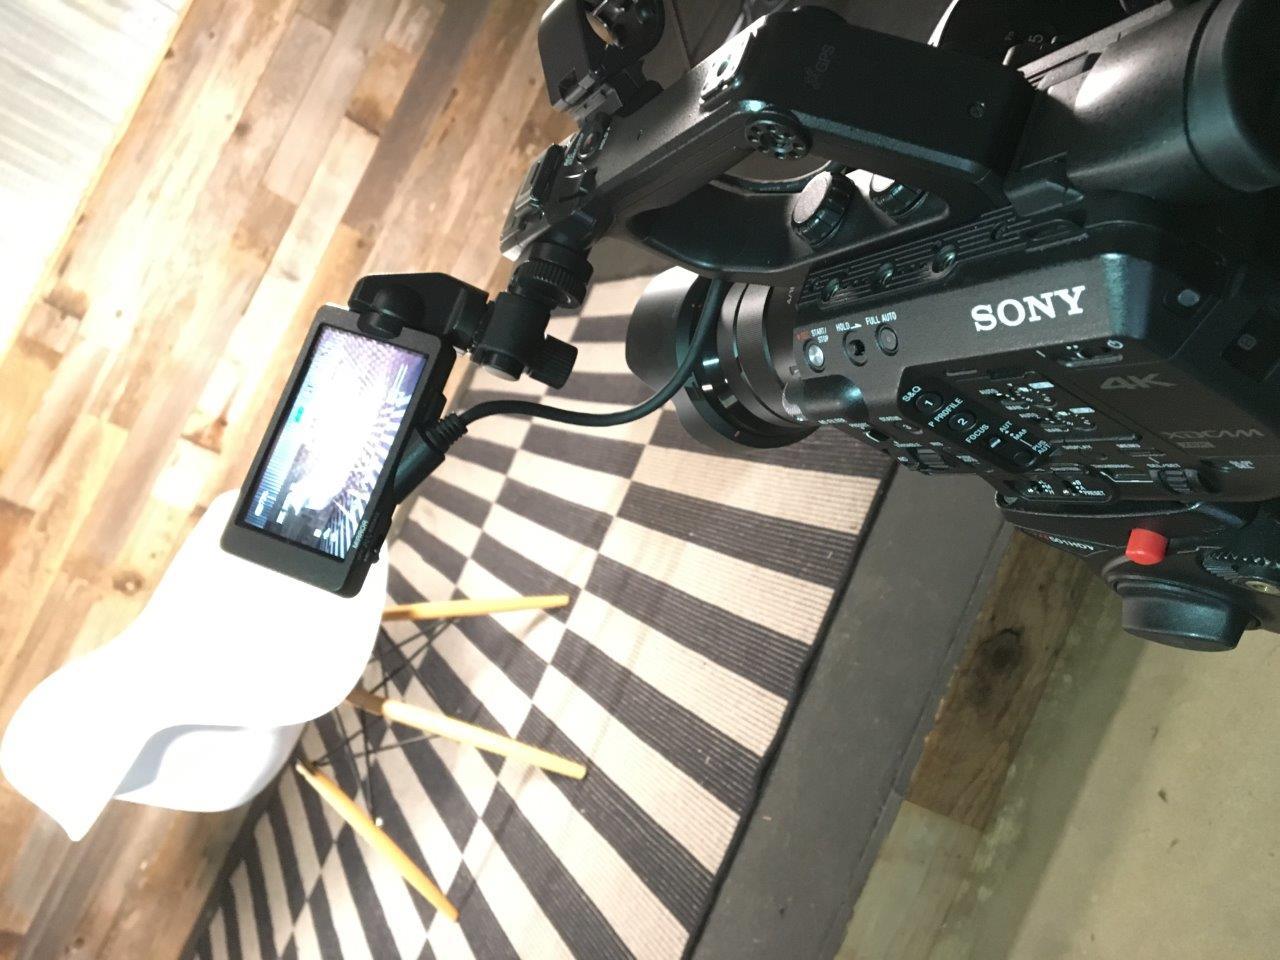 FS7 preparing for a shoot